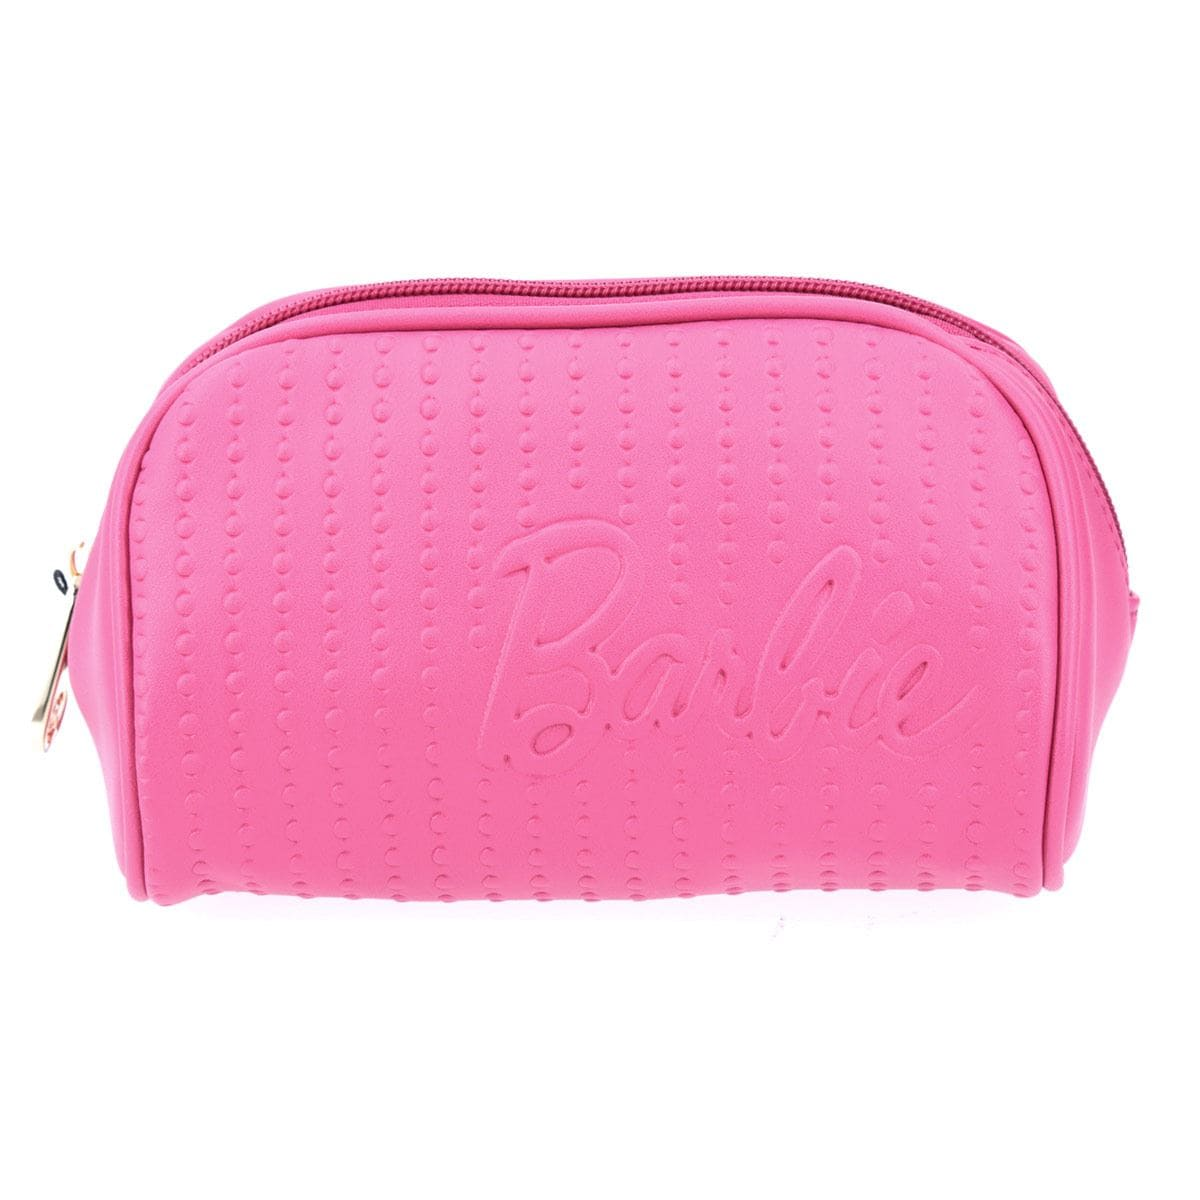 Cosmetiquera Barbie rosa